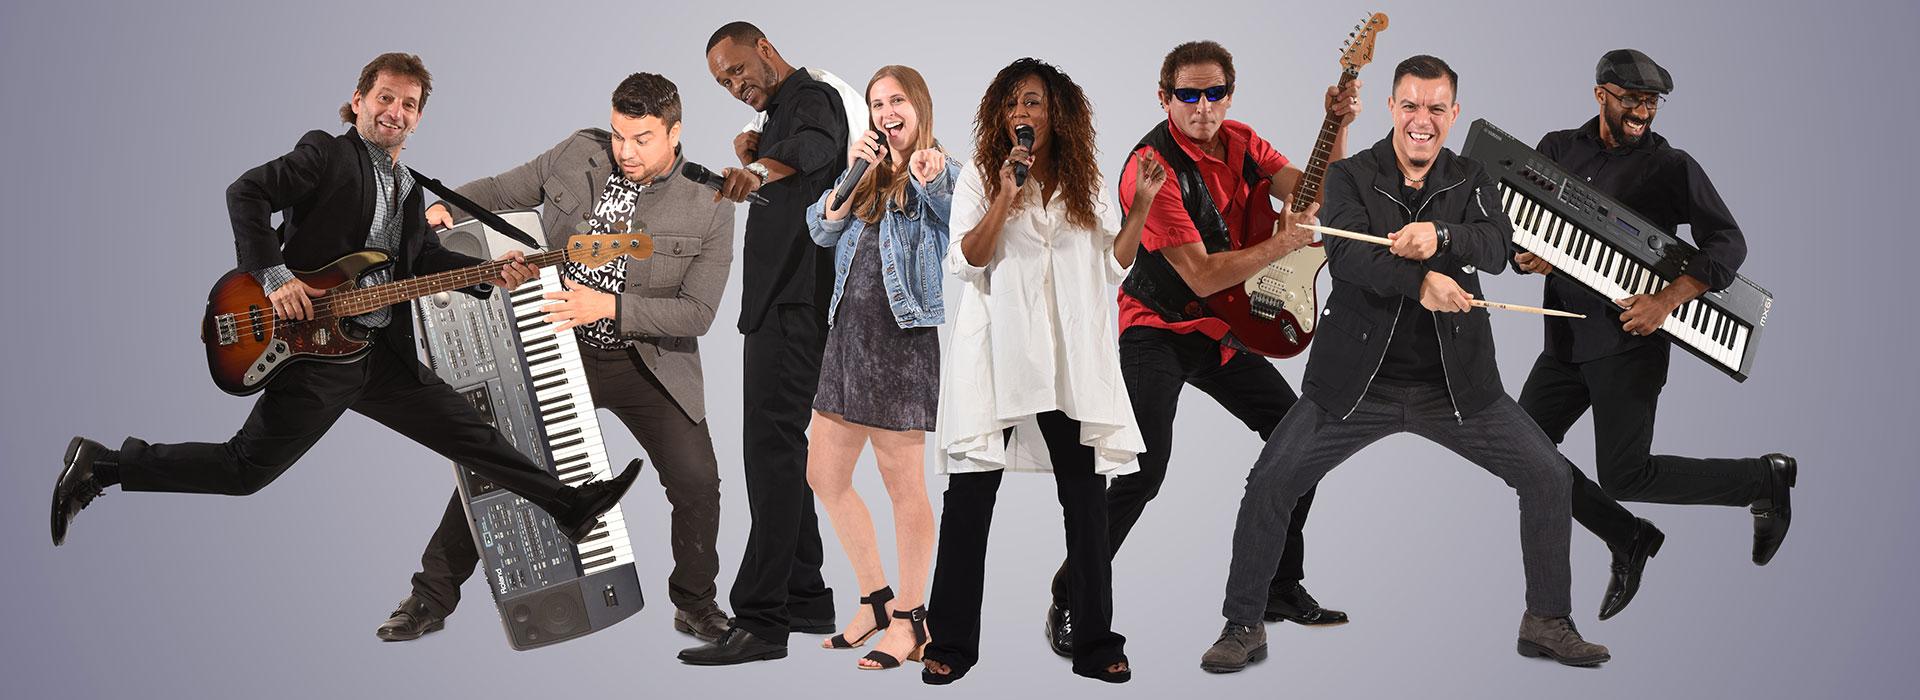 Cover Band Florida